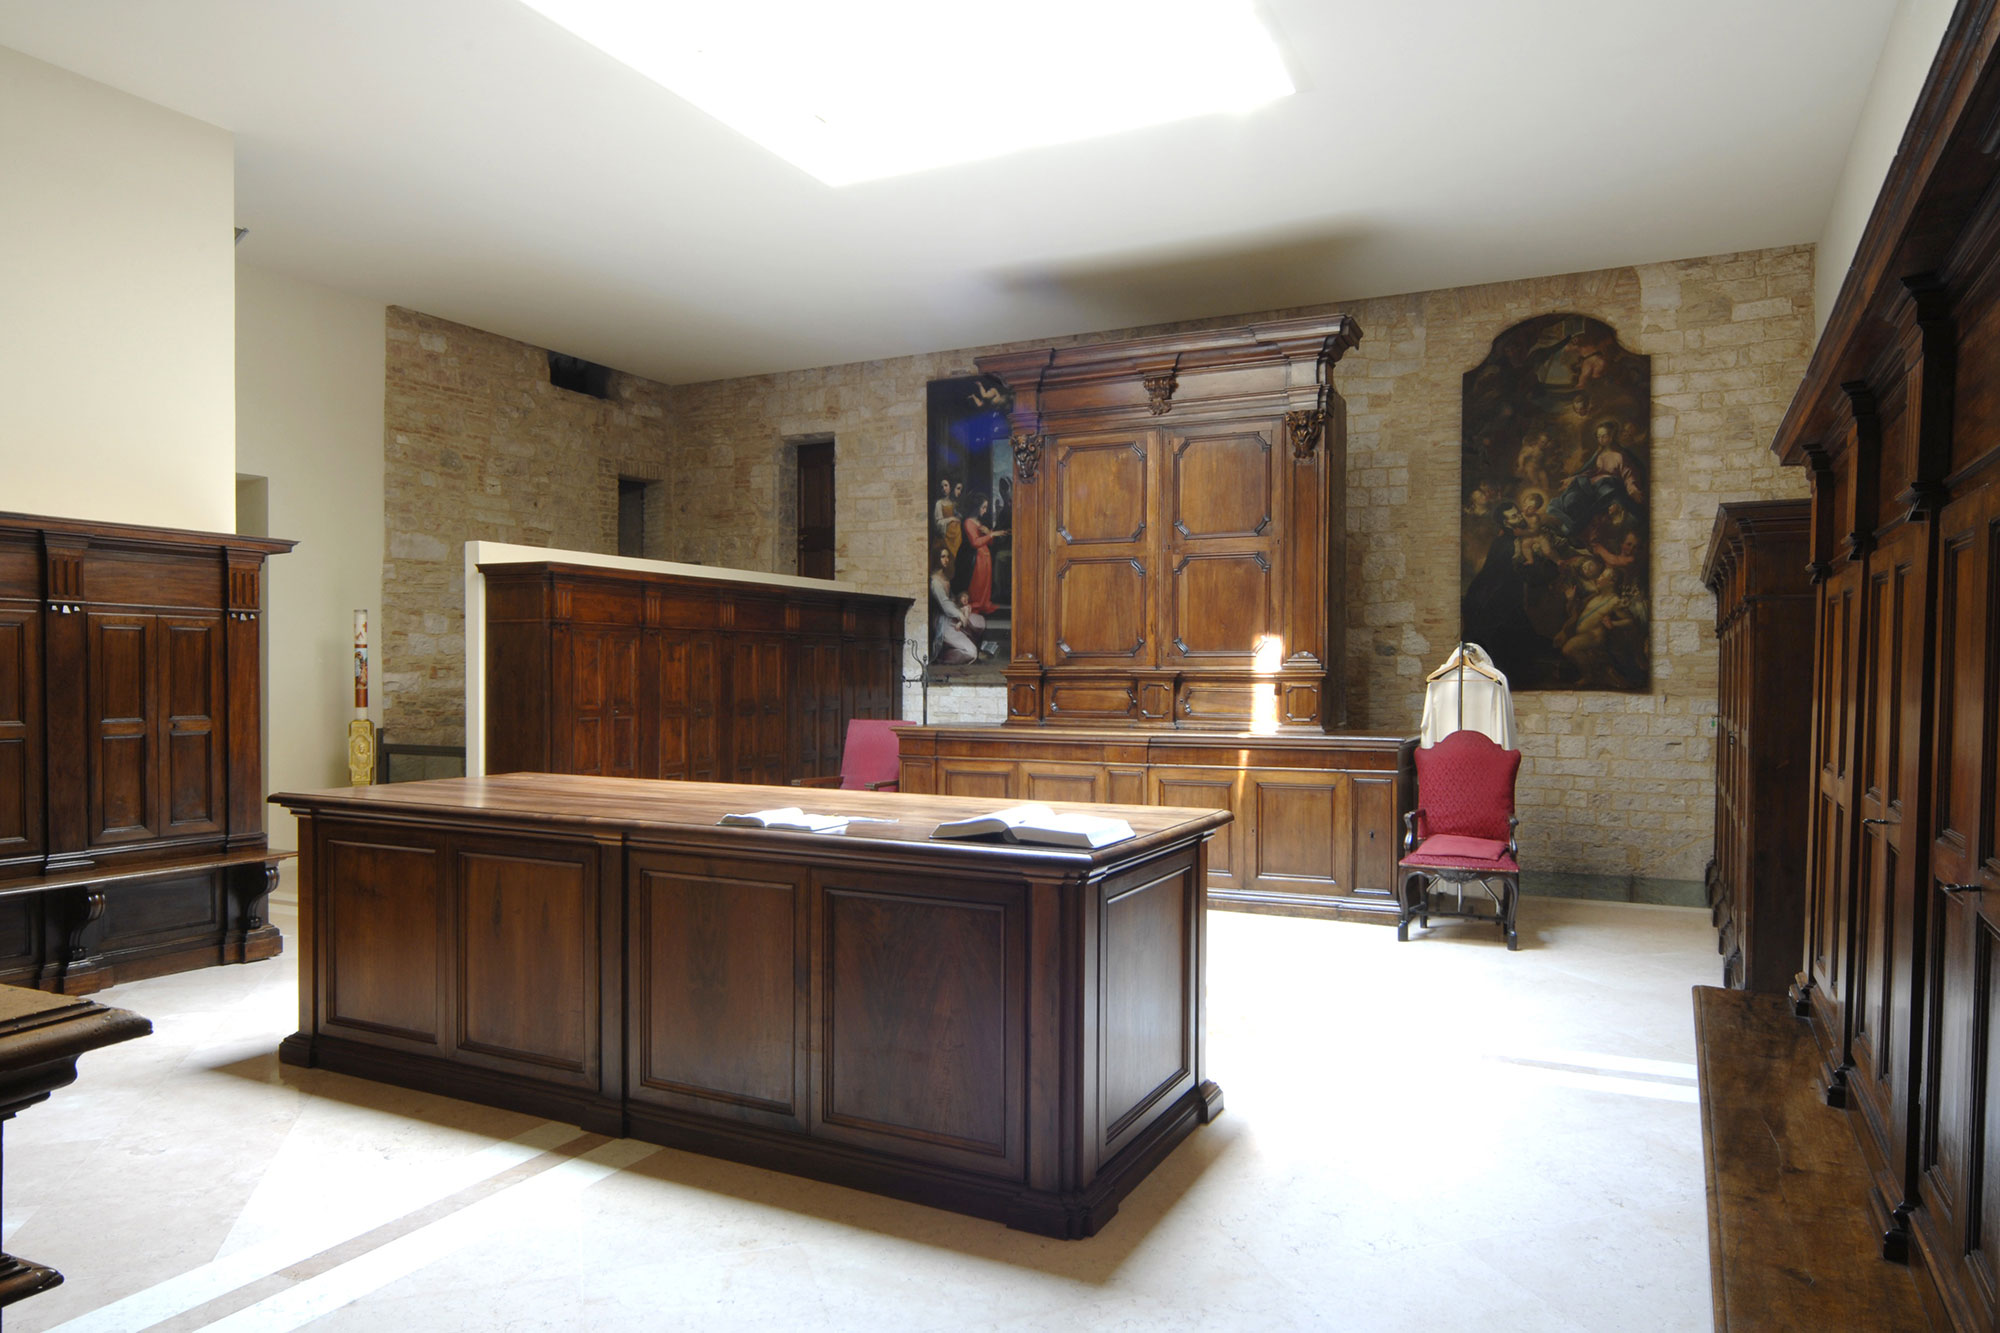 Cattedrale-06